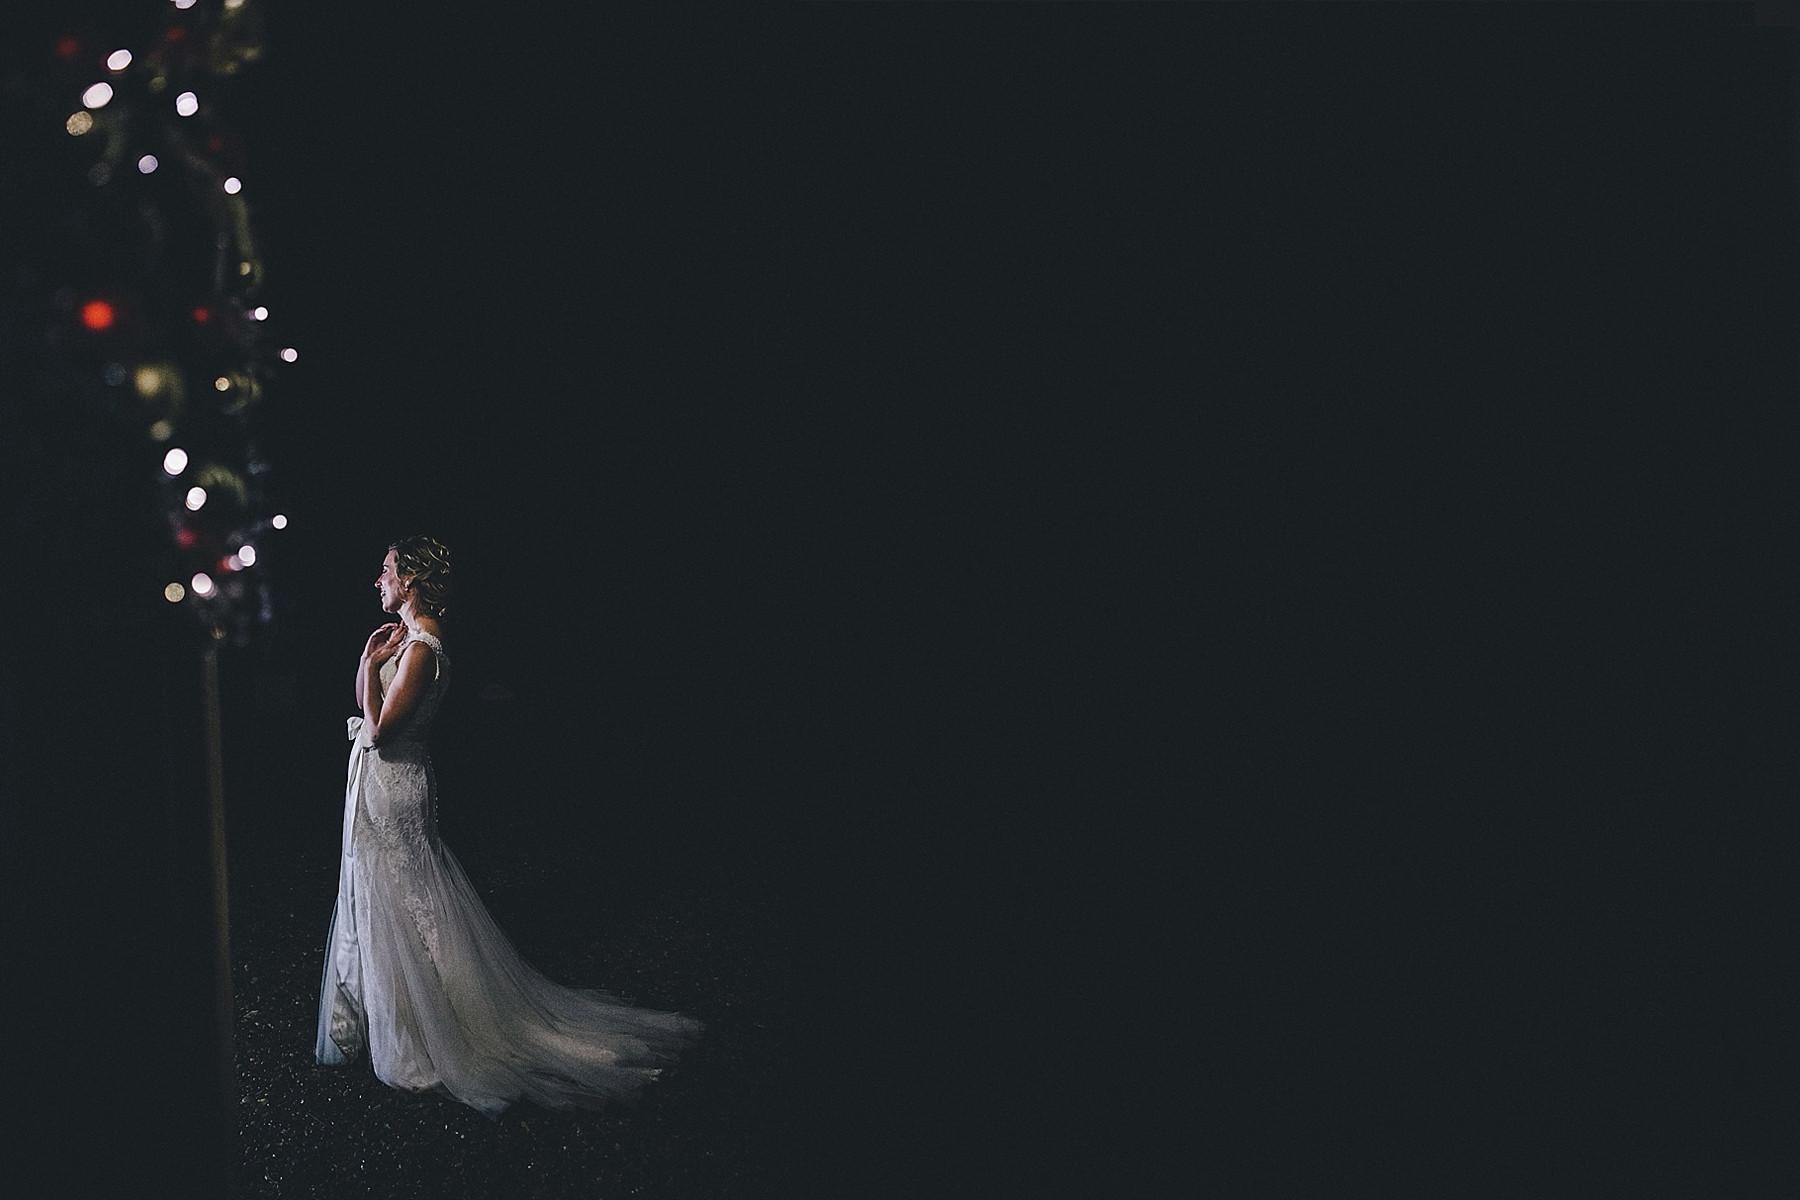 the_twins_wedding_photographer_dress_eshott1-1800x1200.jpg